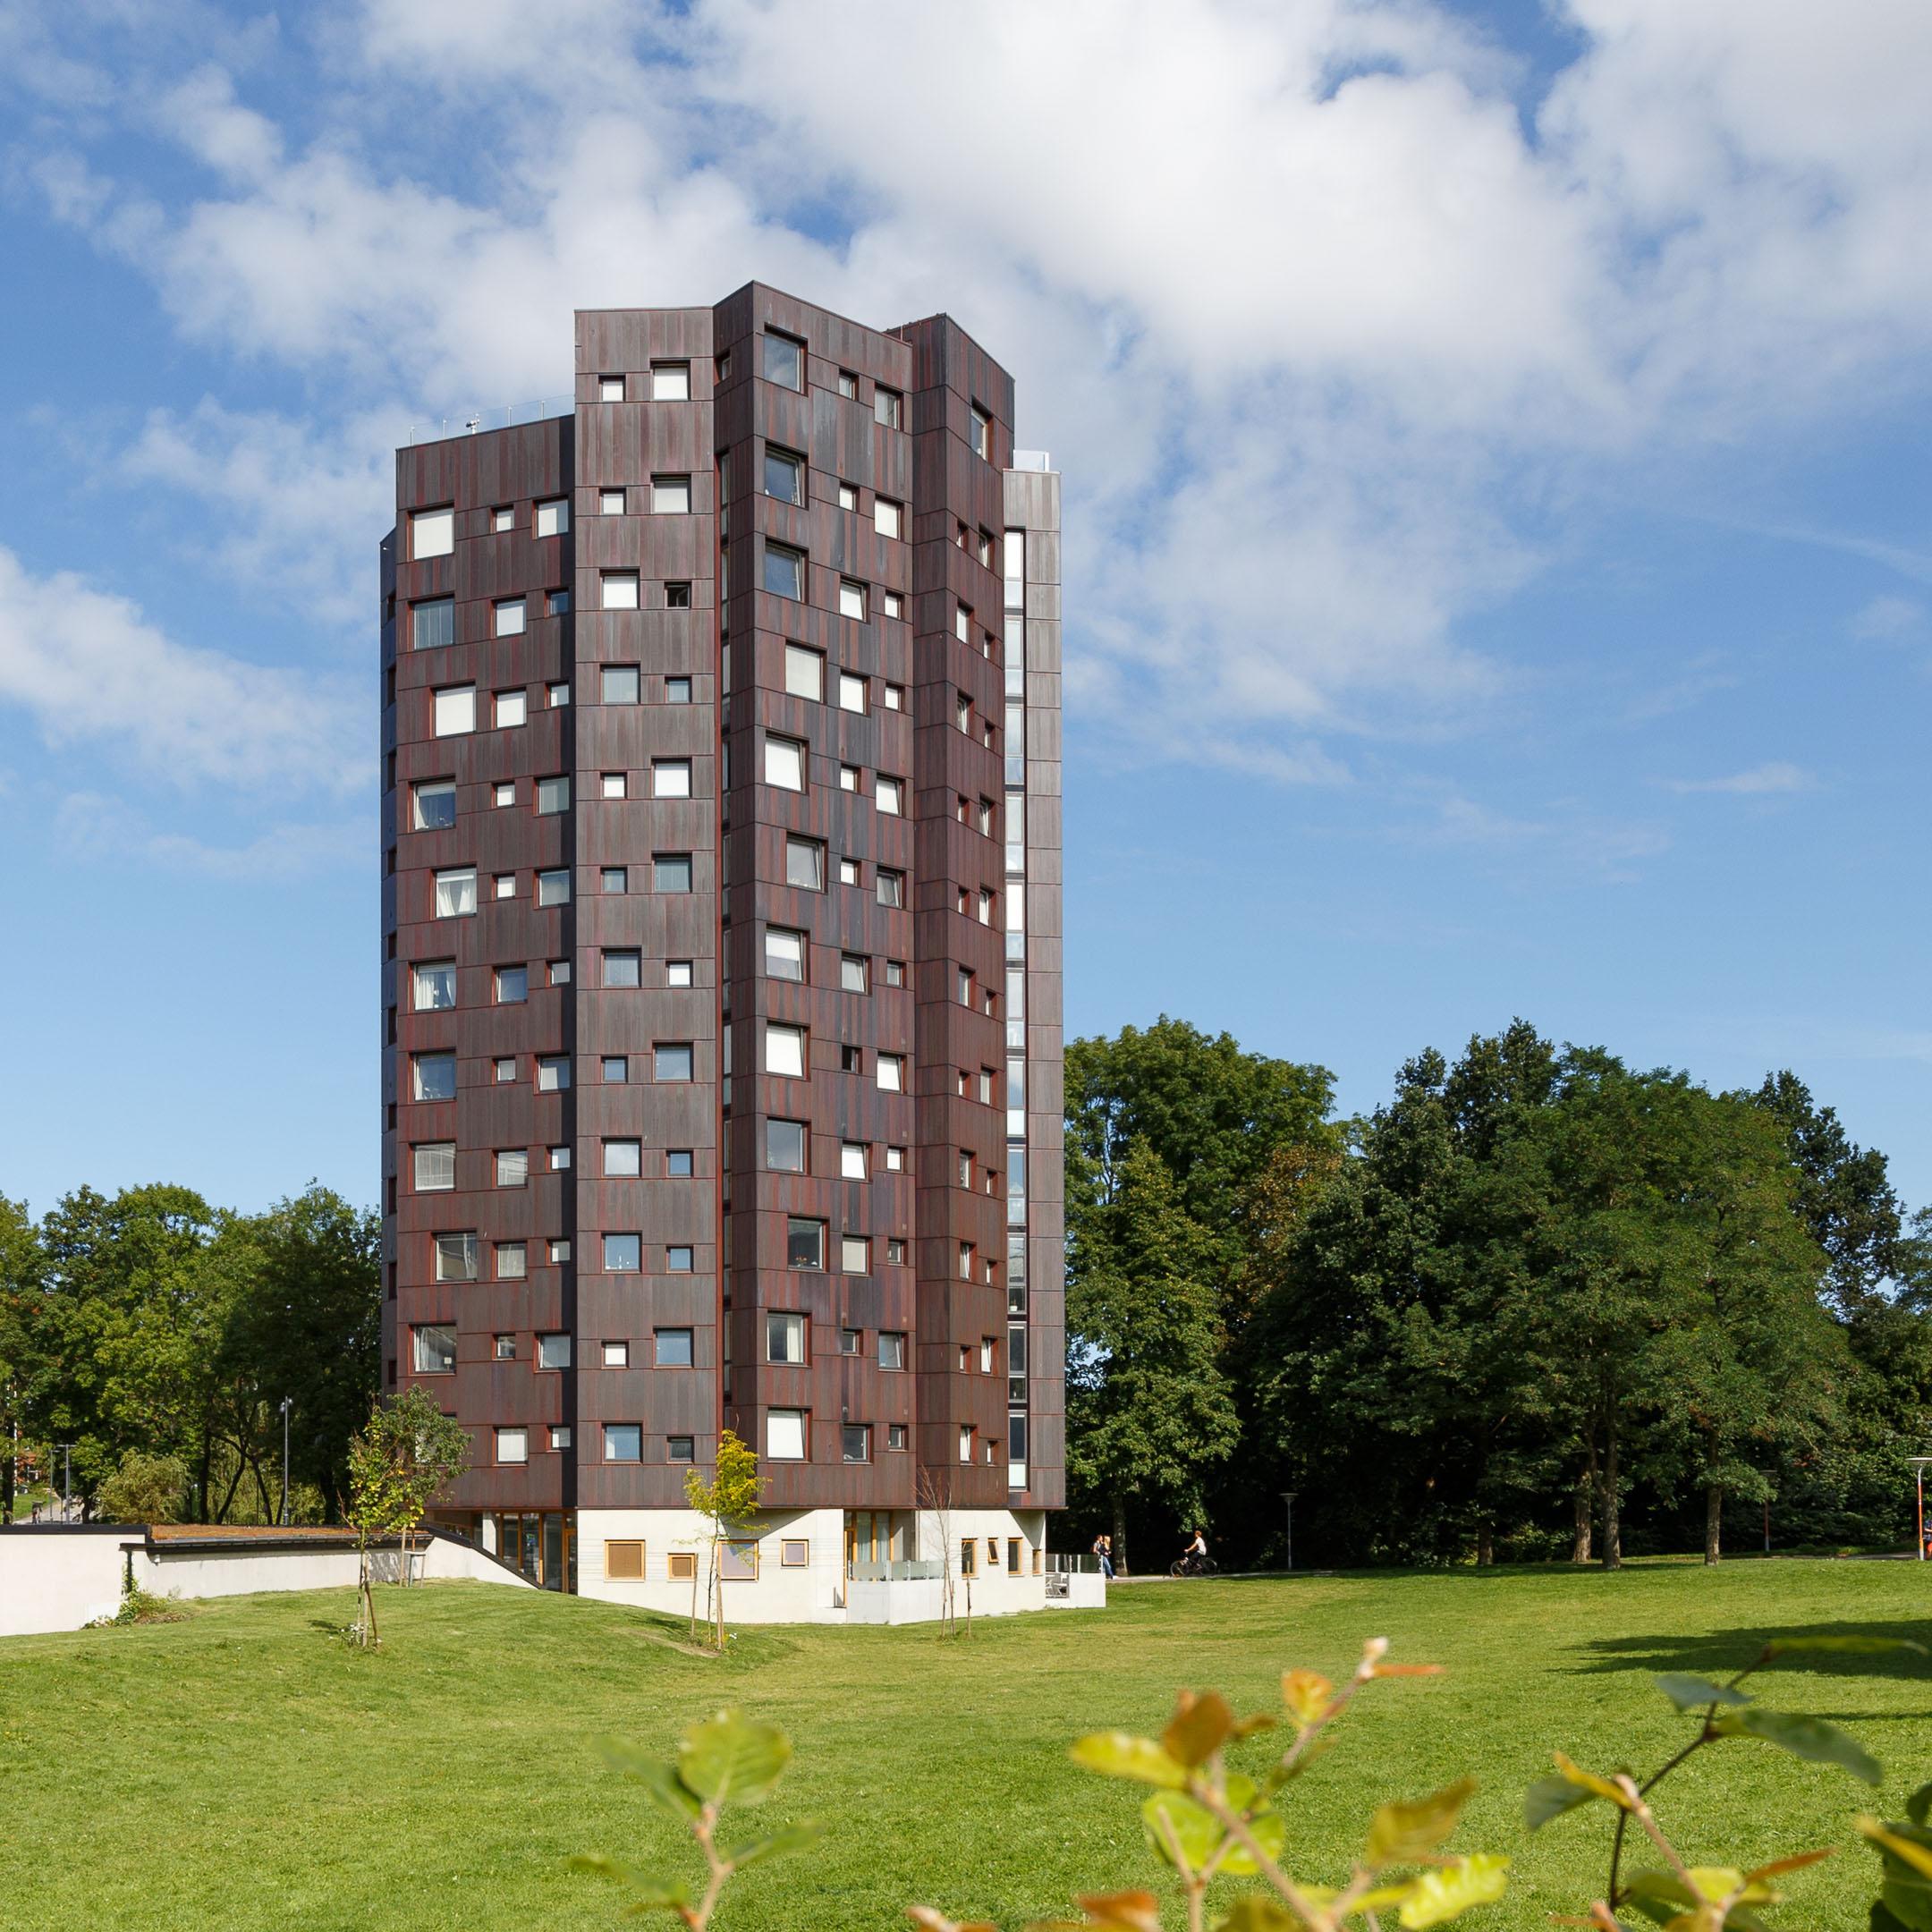 Tornet Helsingkrona i Lund